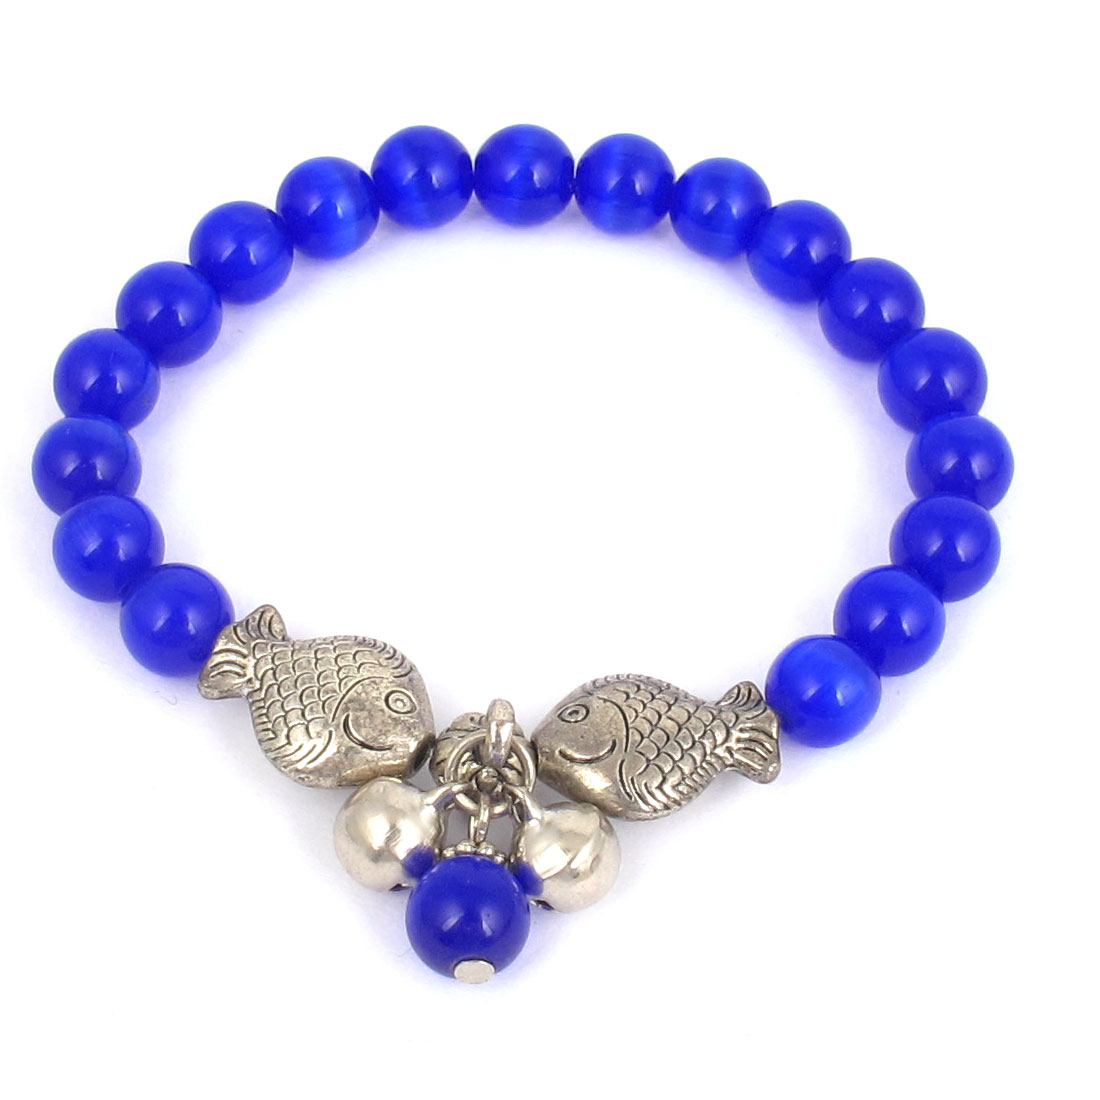 Fish Detail Round Opal Bead Wrist Ornament Bangle Bracelet Dark Blue Silver Tone for Women